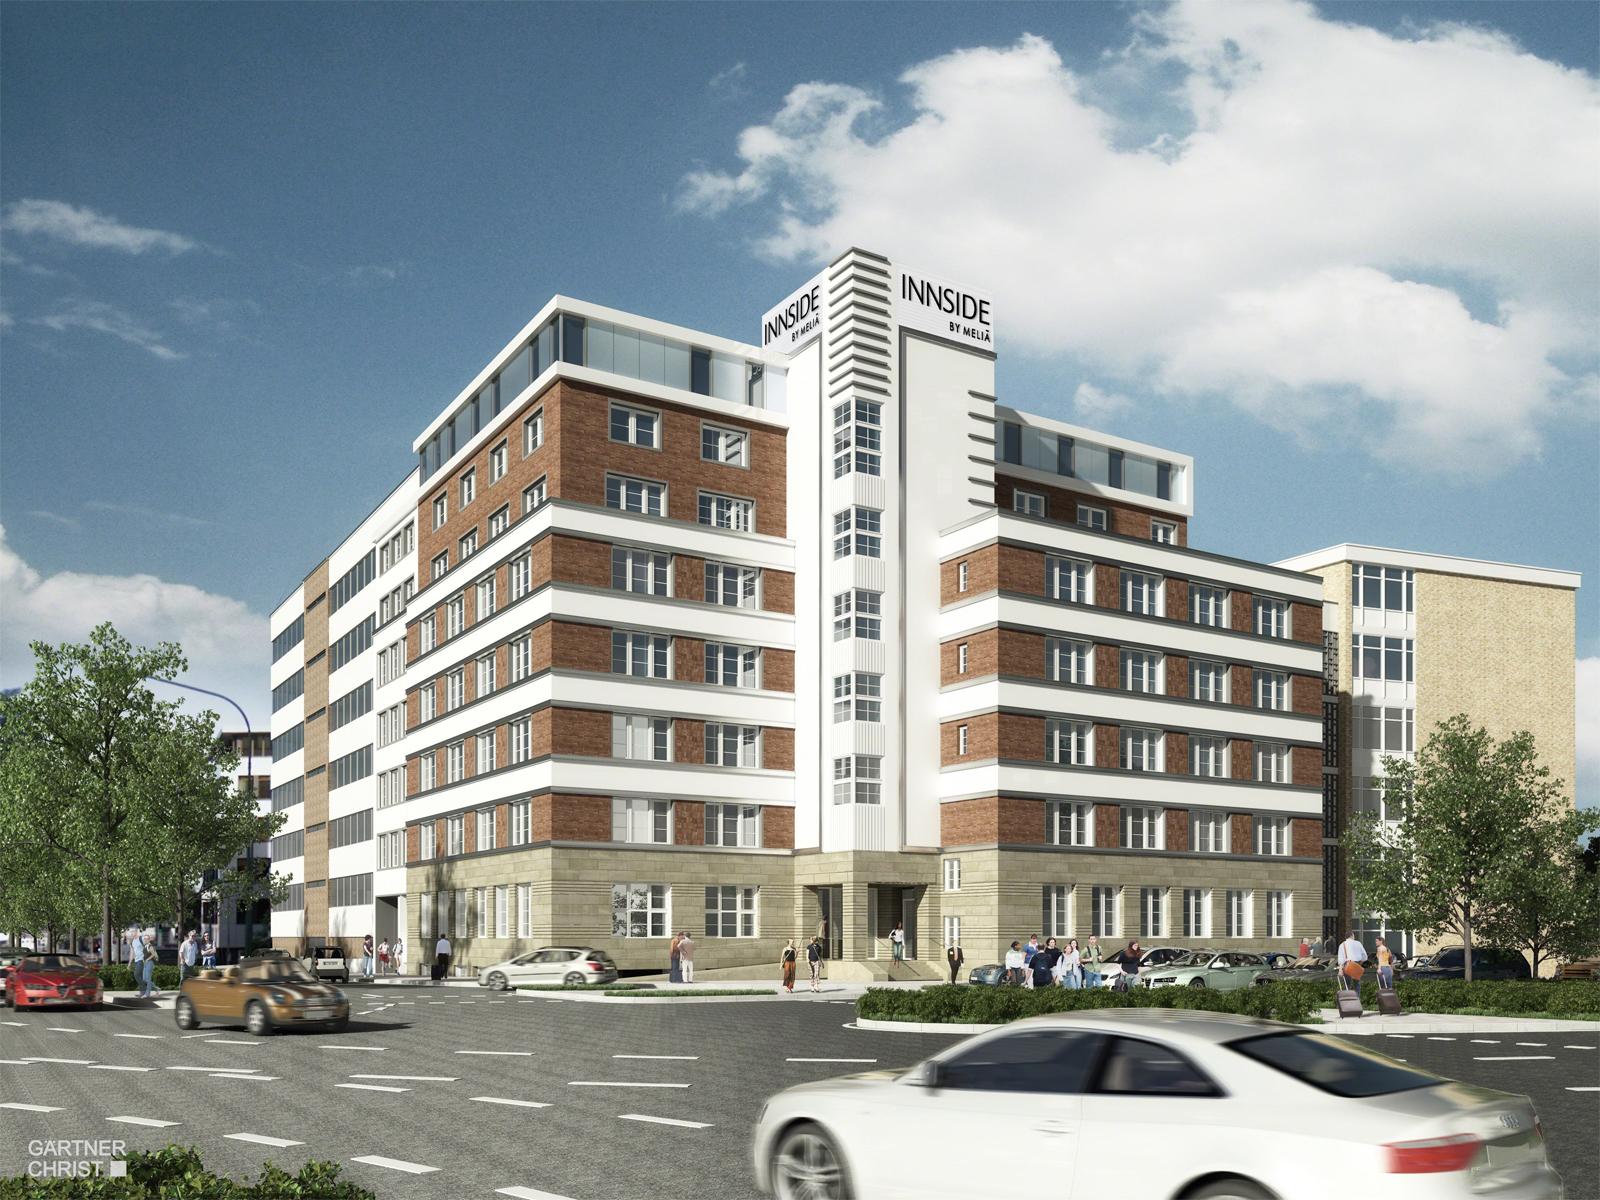 Meli hotels international to open a new innside by meli for Designhotel essen